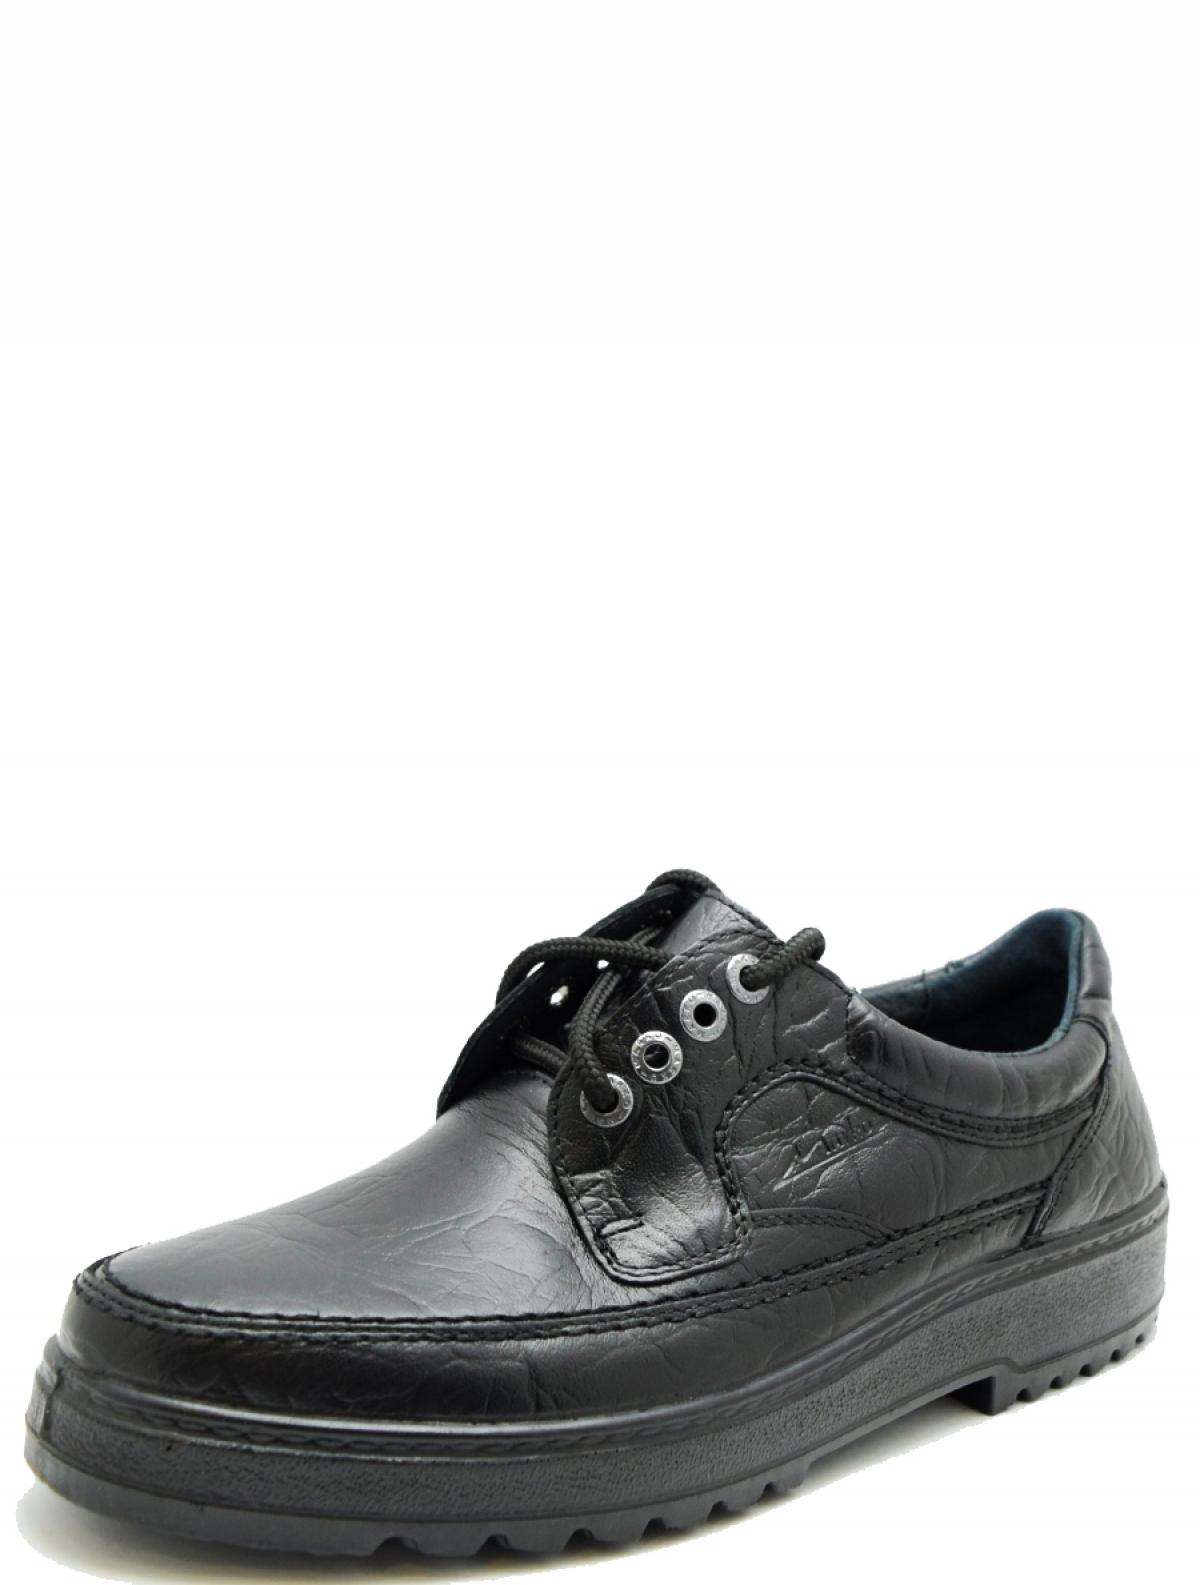 Marko 4351 мужские туфли